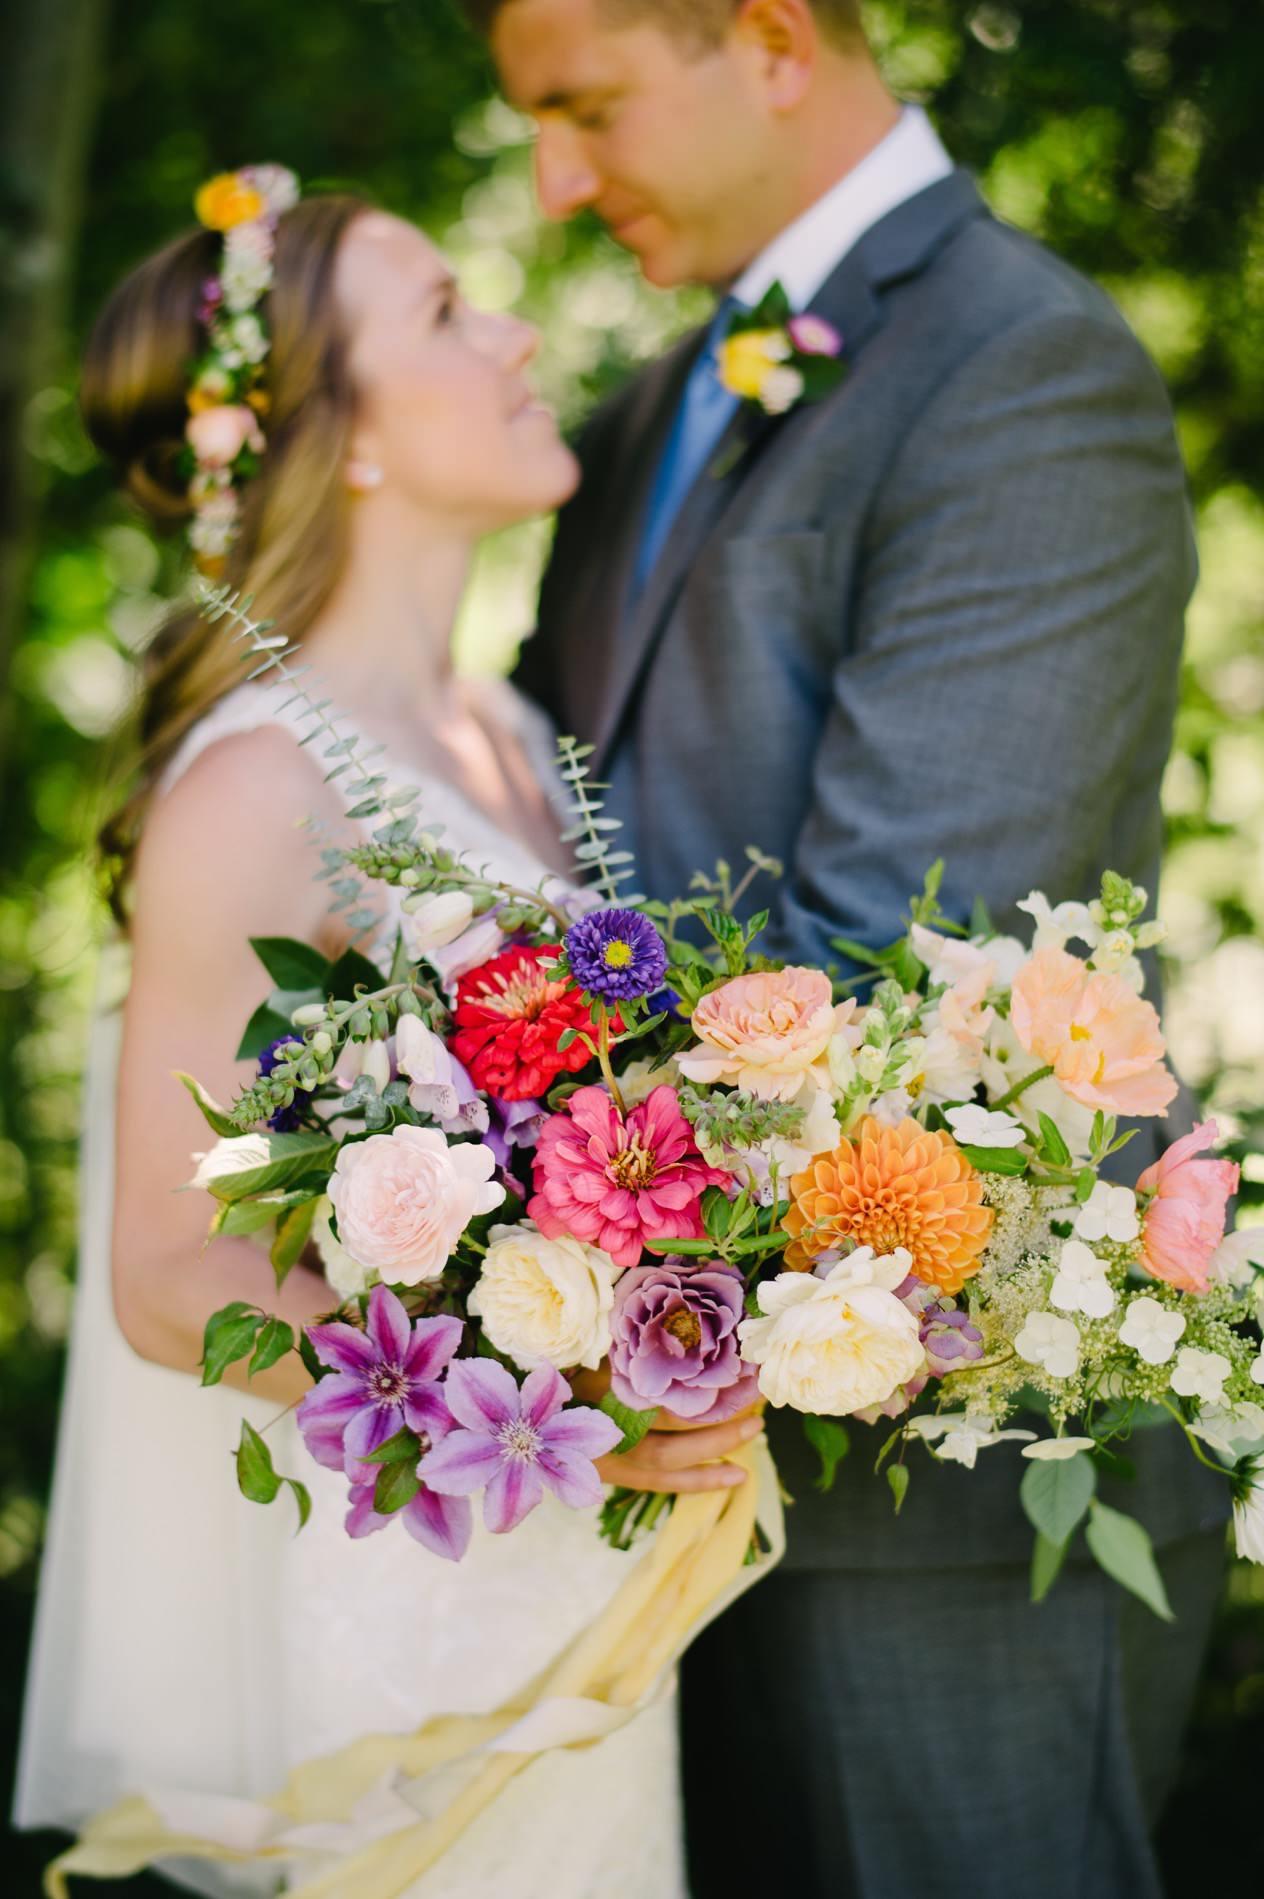 rainbow colored wedding bouquet at mt hood organic farms.jpg